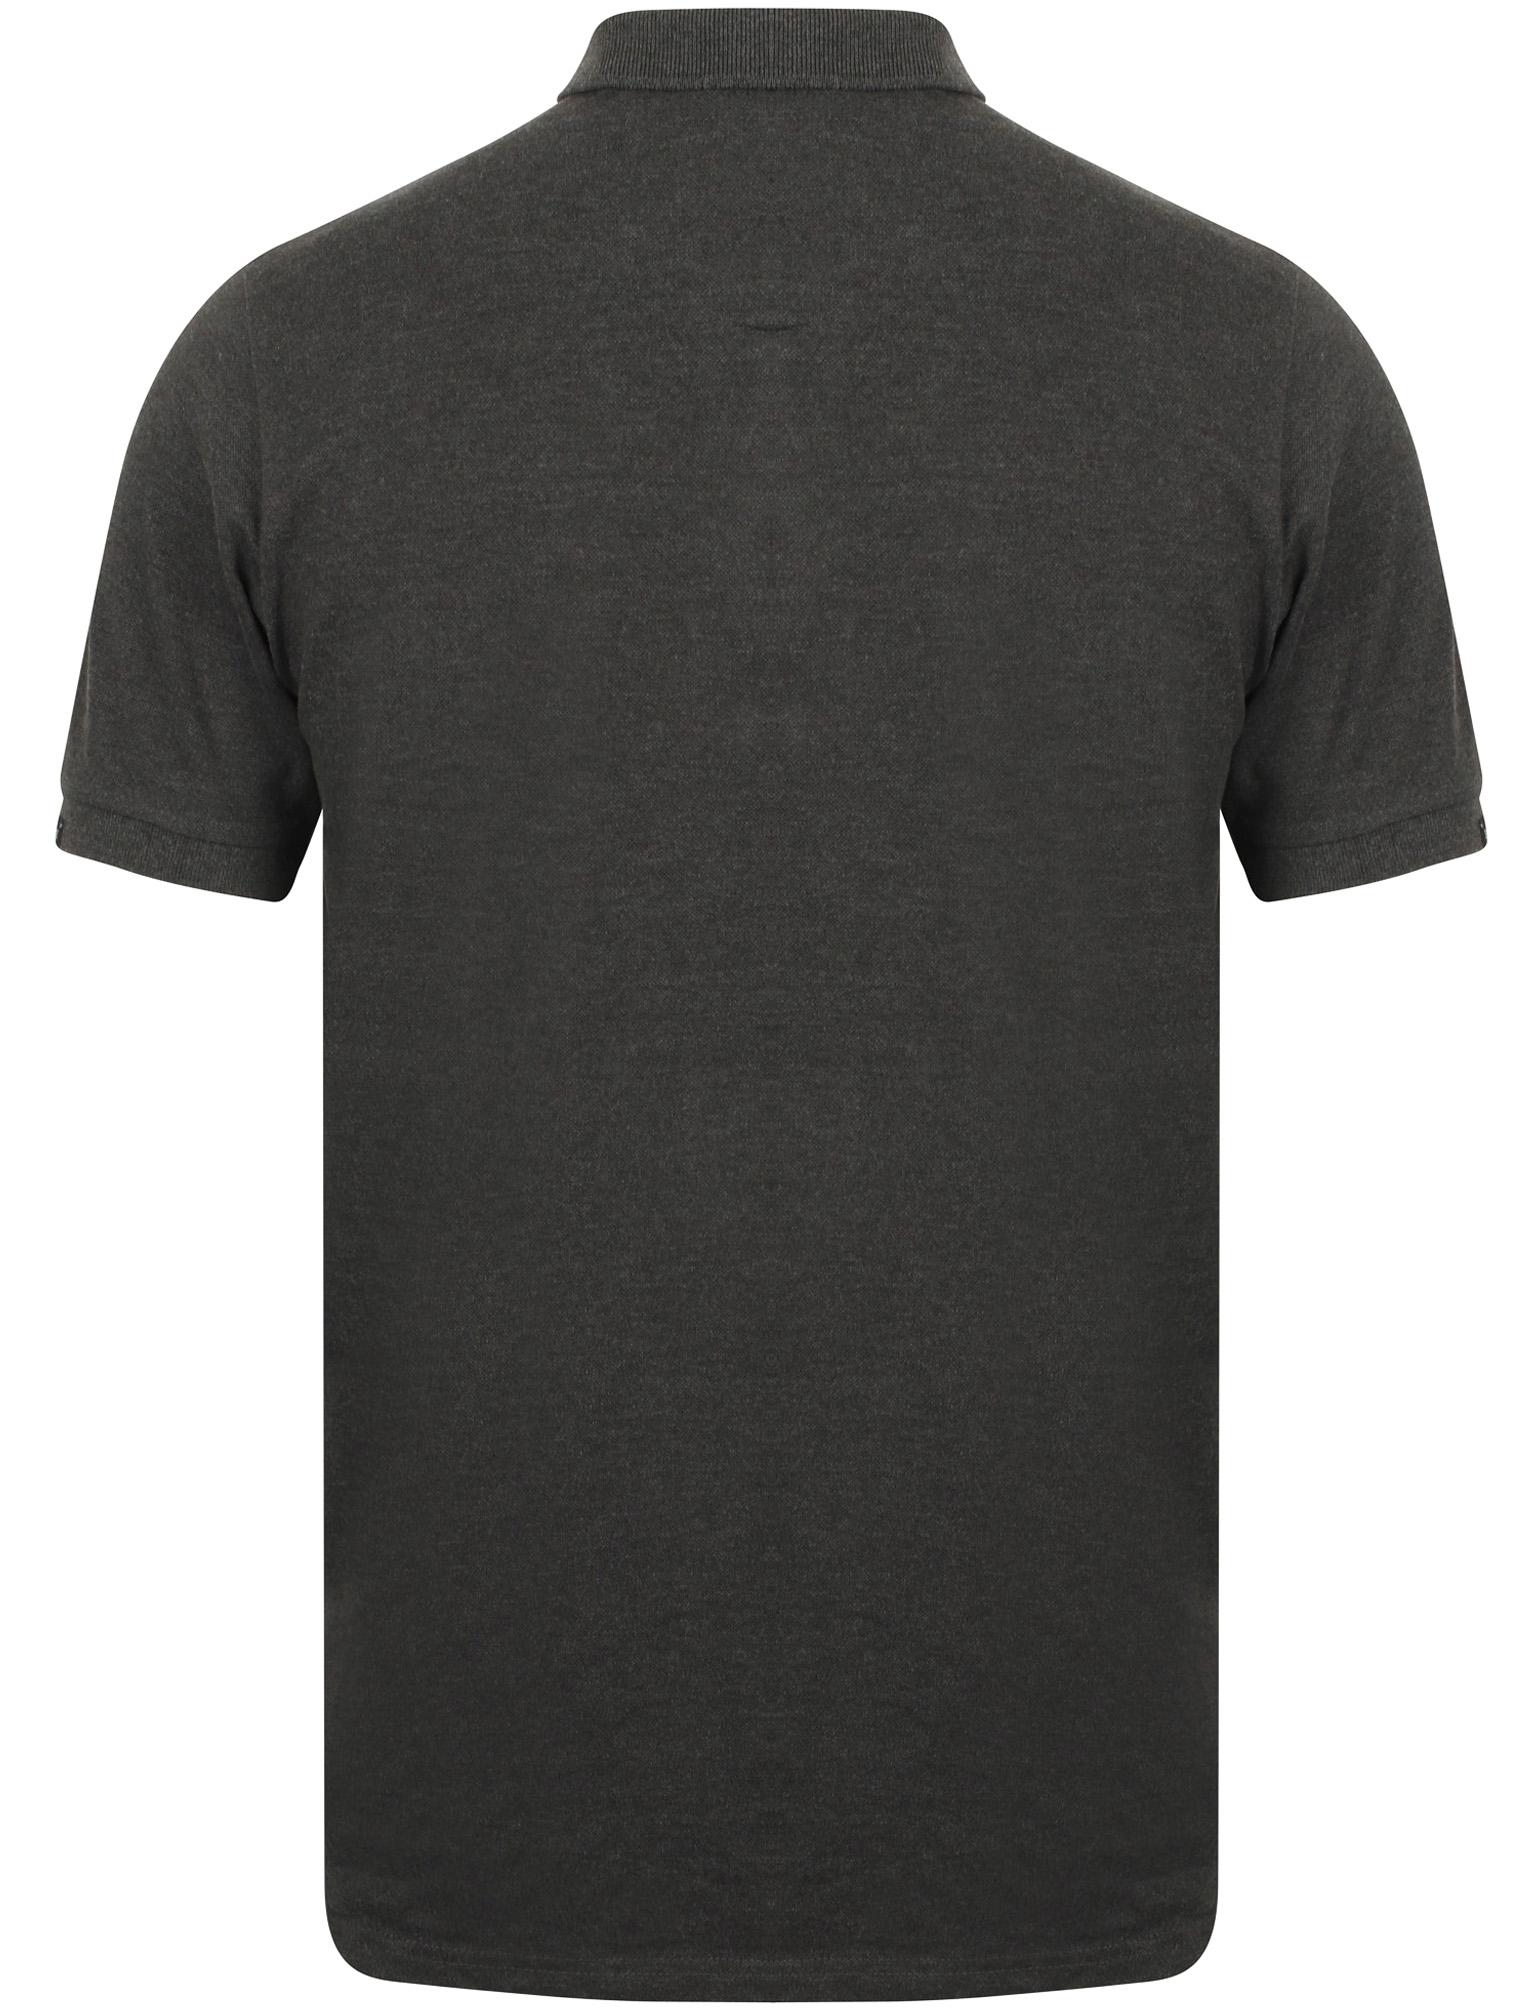 New-Mens-Tokyo-Laundry-Branded-Kuusamo-Cotton-Rich-Pique-Polo-Shirt-Size-S-XXL thumbnail 20